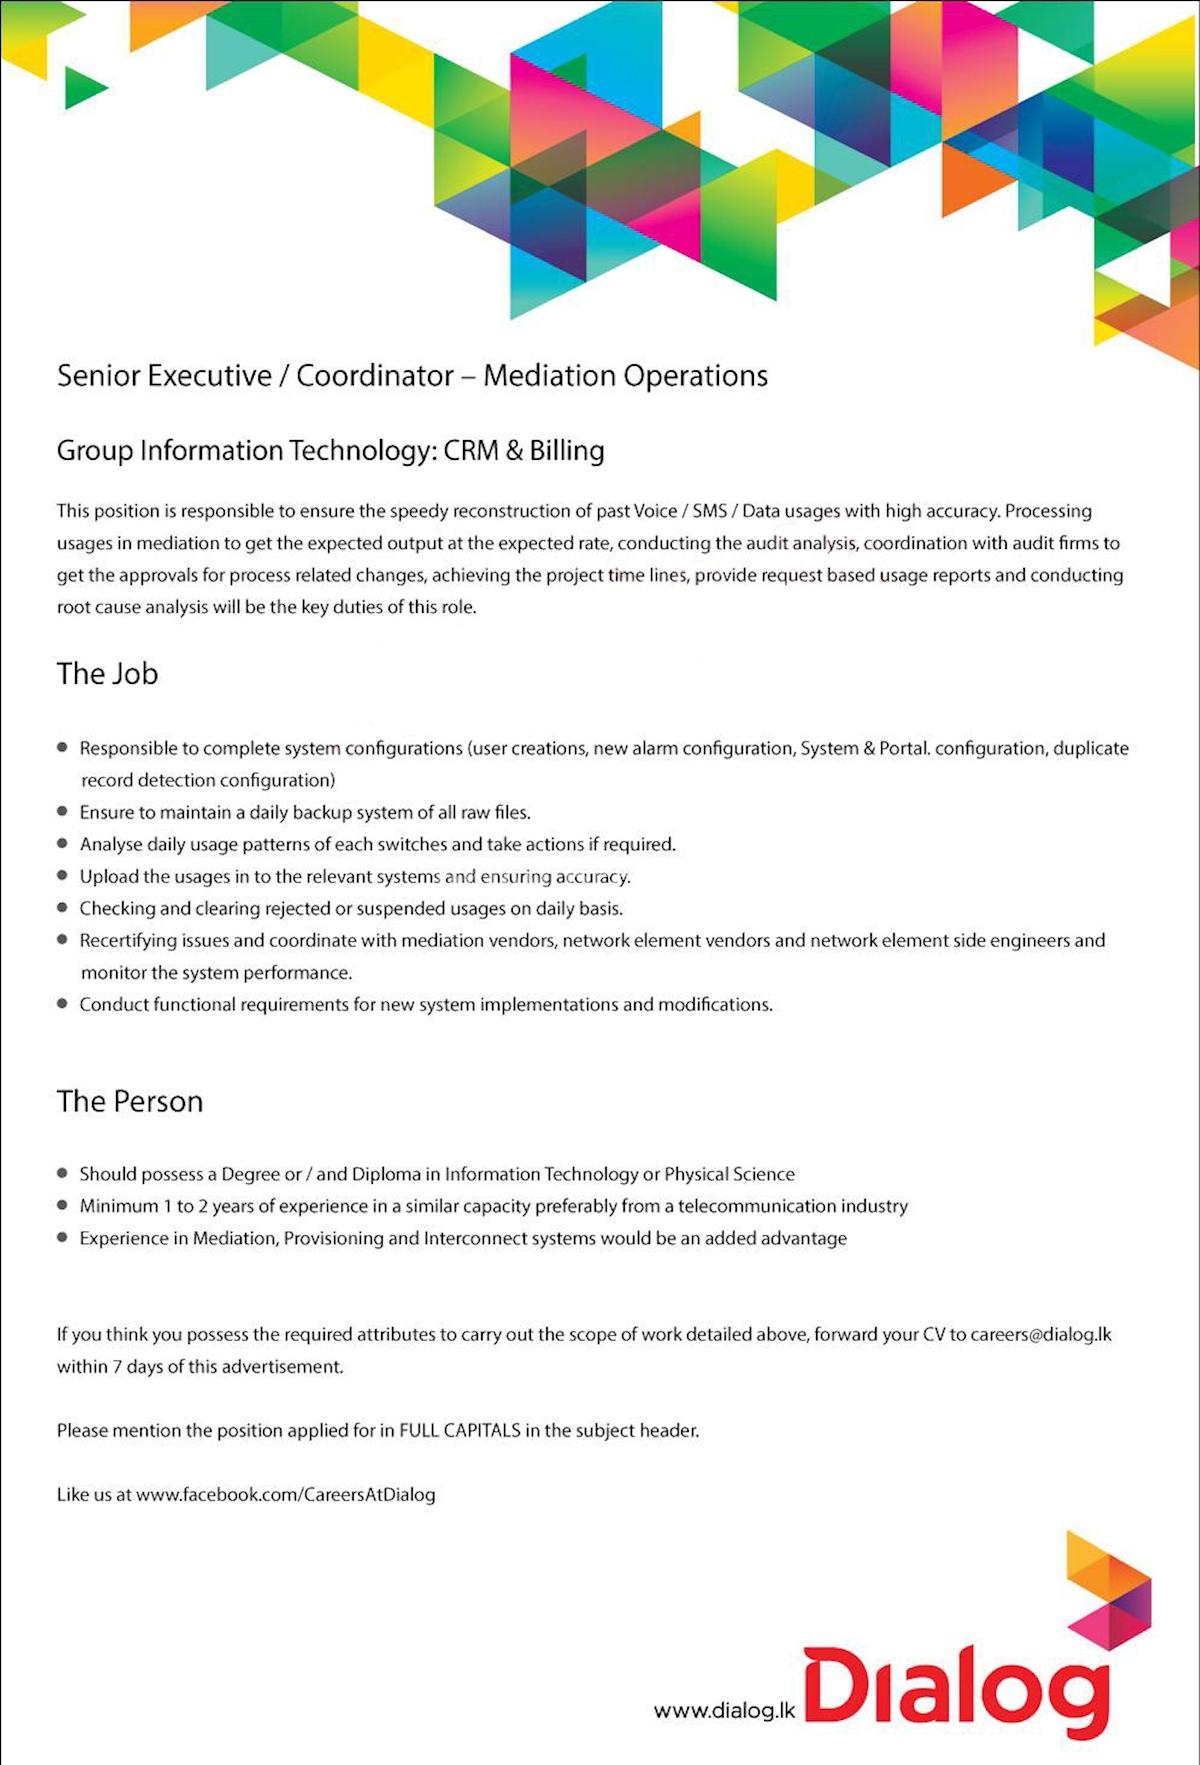 Senior Executive/Coordinator - Mediation Operations